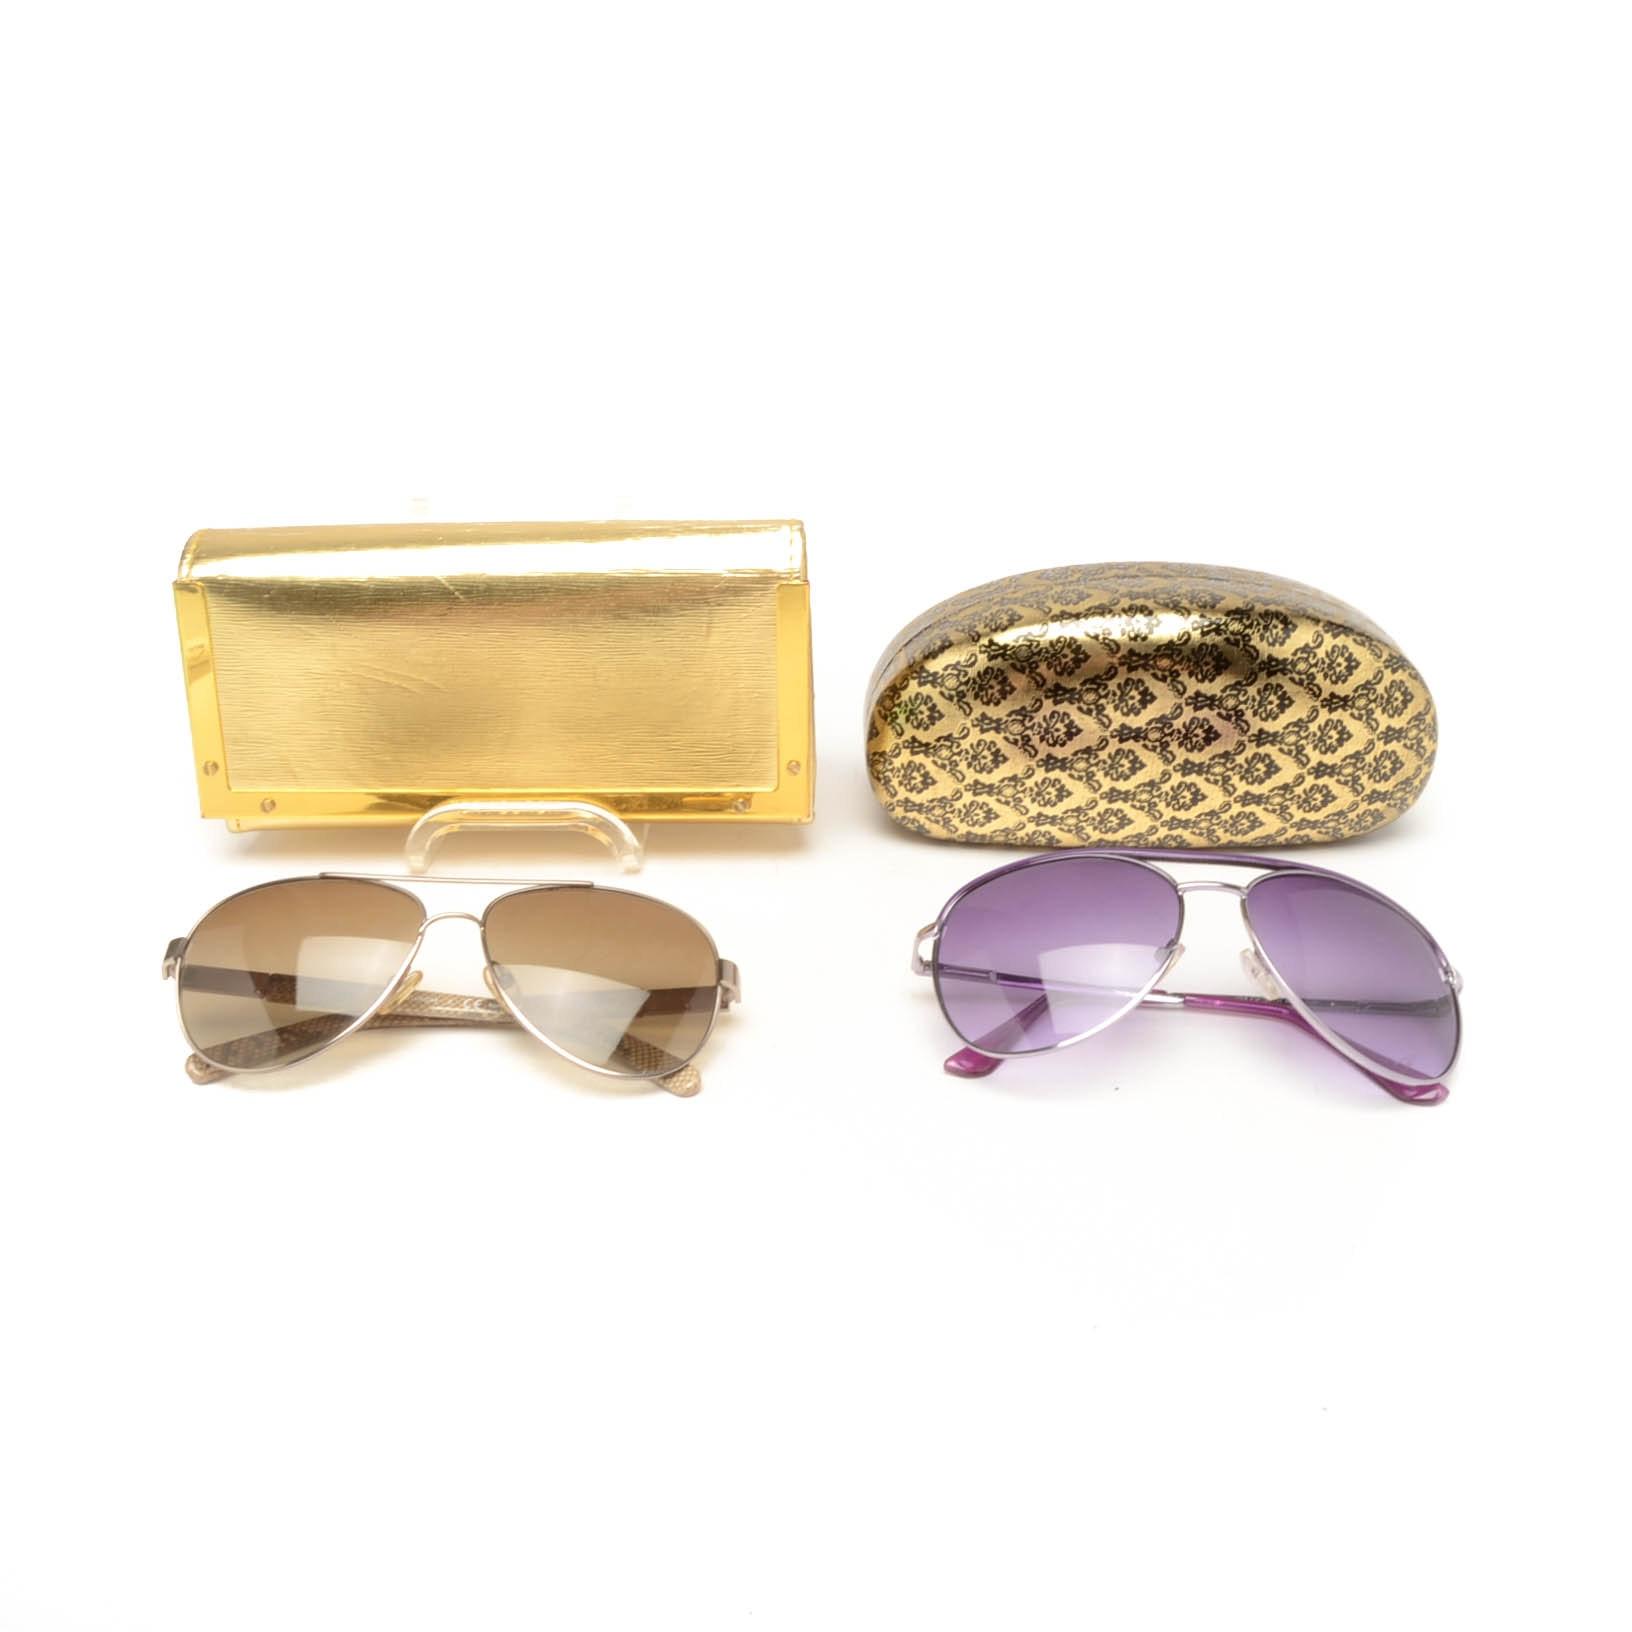 Tory Burch and Andrea Jovine Designer Sunglasses